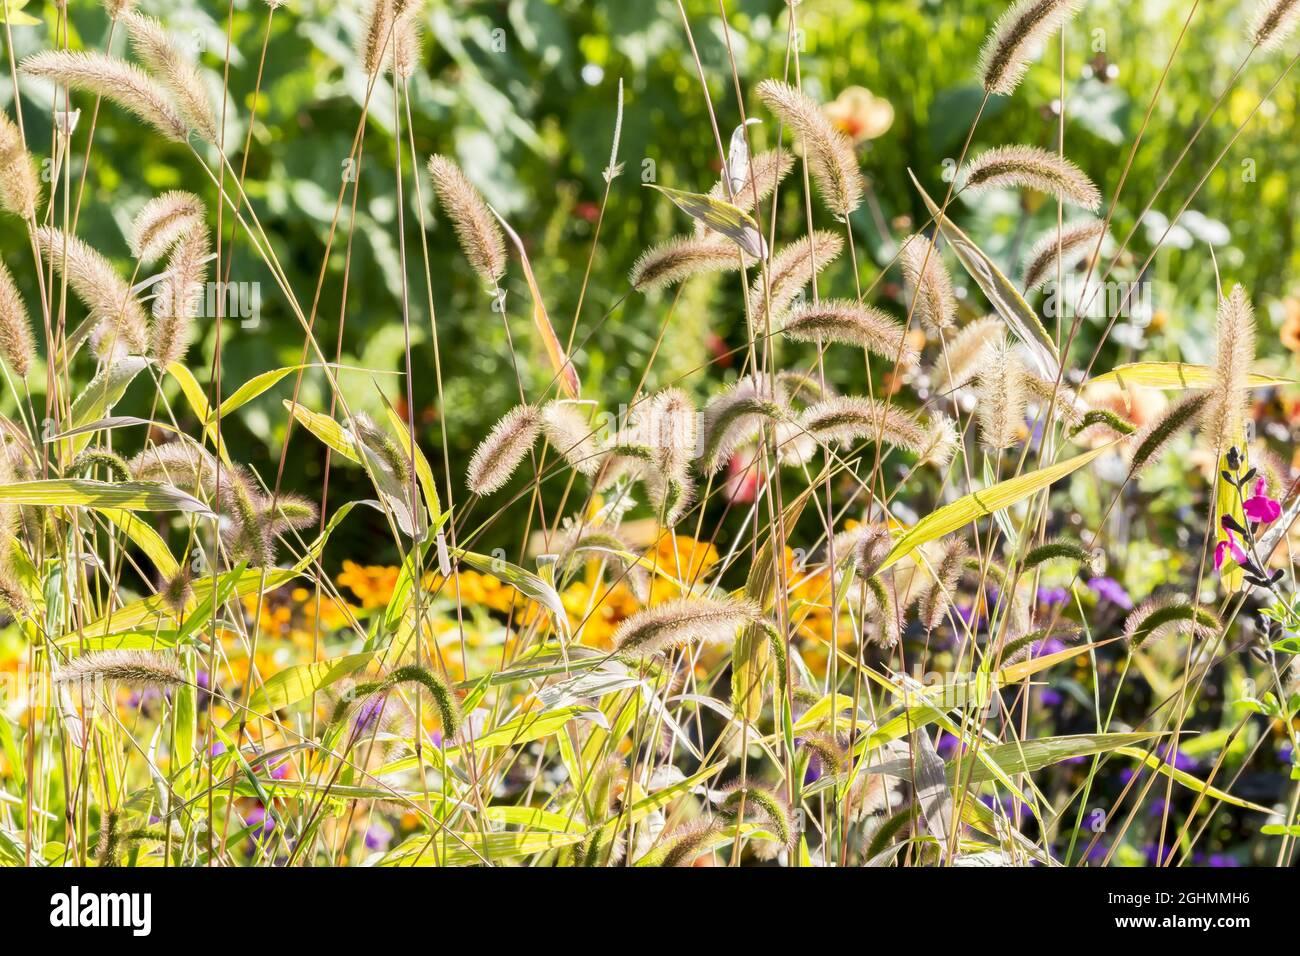 Setaria atropurpurea viridis 'Caramel' Foto de stock